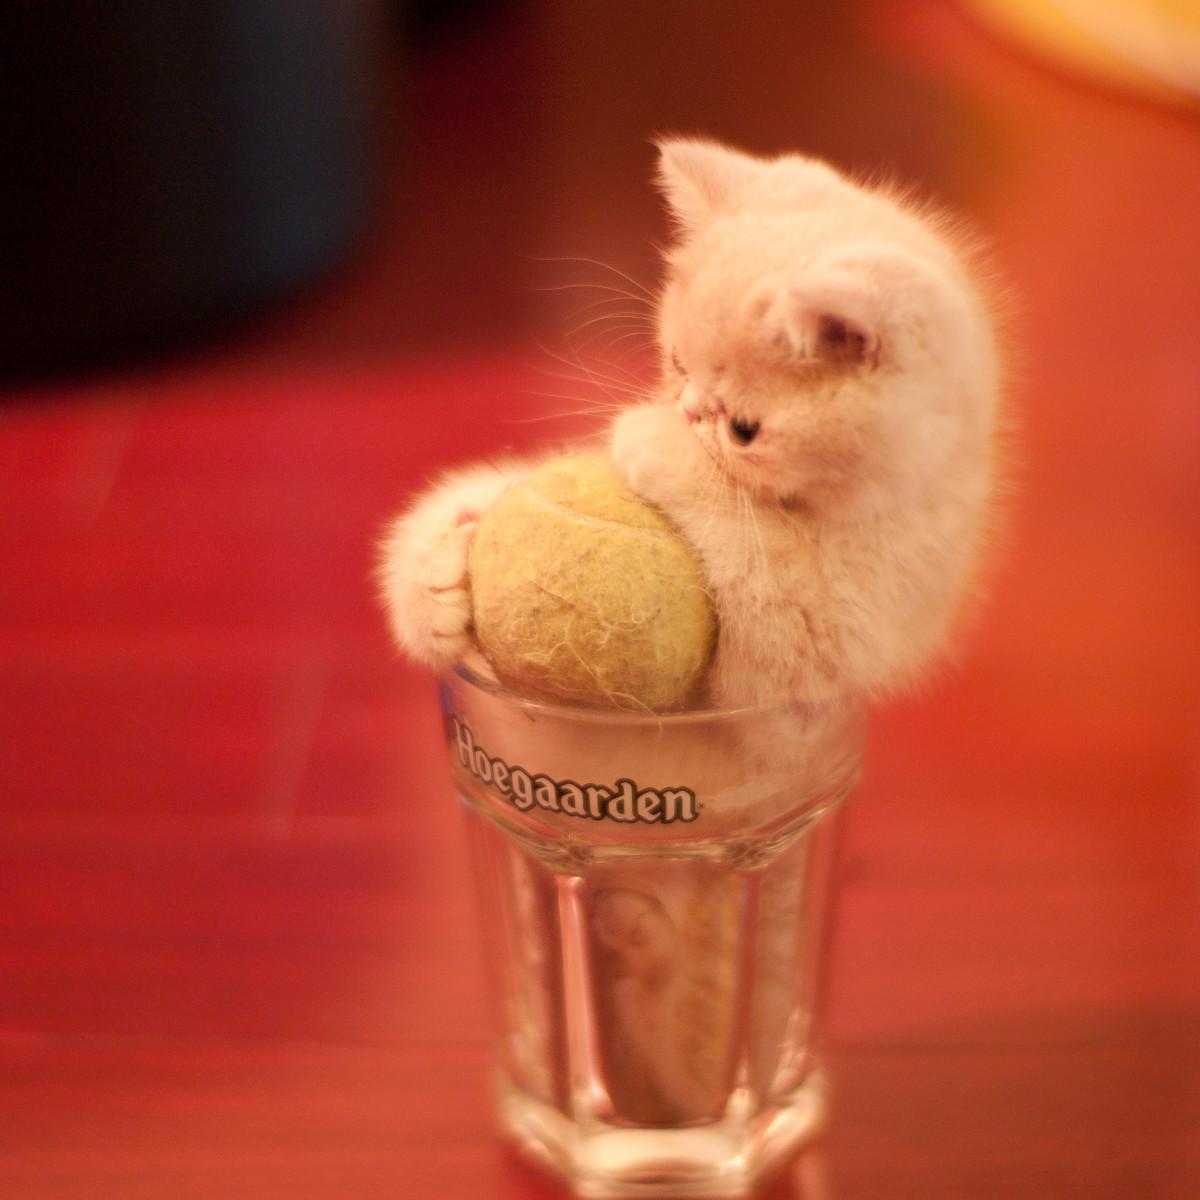 Great Internet Hoaxes: The Bonsai Kitten Prank